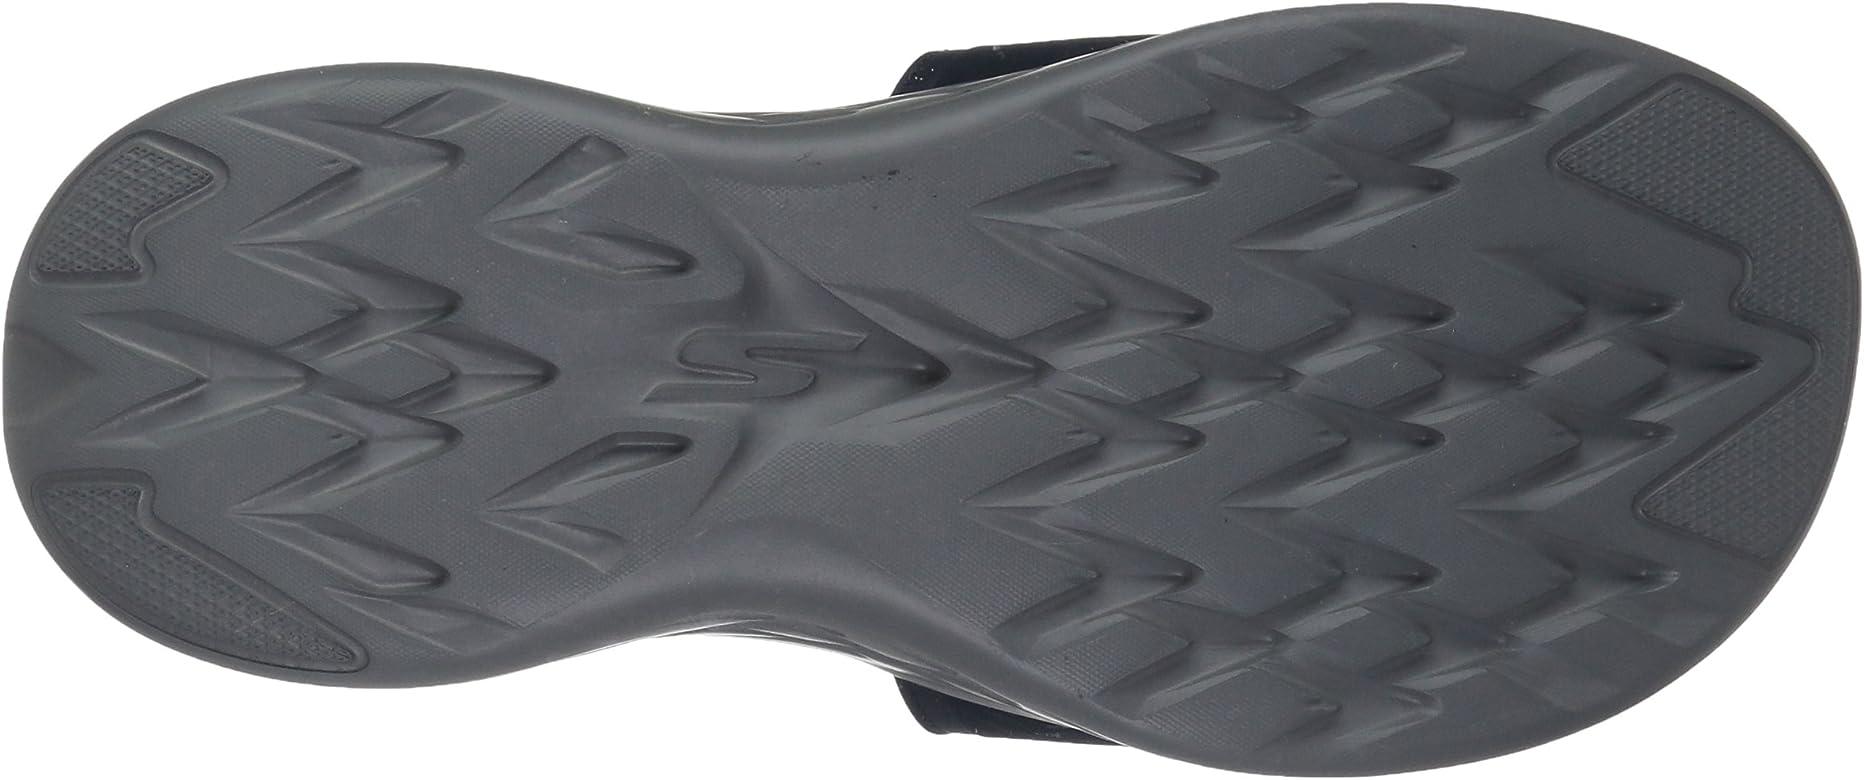 3dfbfabef Amazon.com  Skechers Performance Men s on-the-Go 600-55355 Slide ...